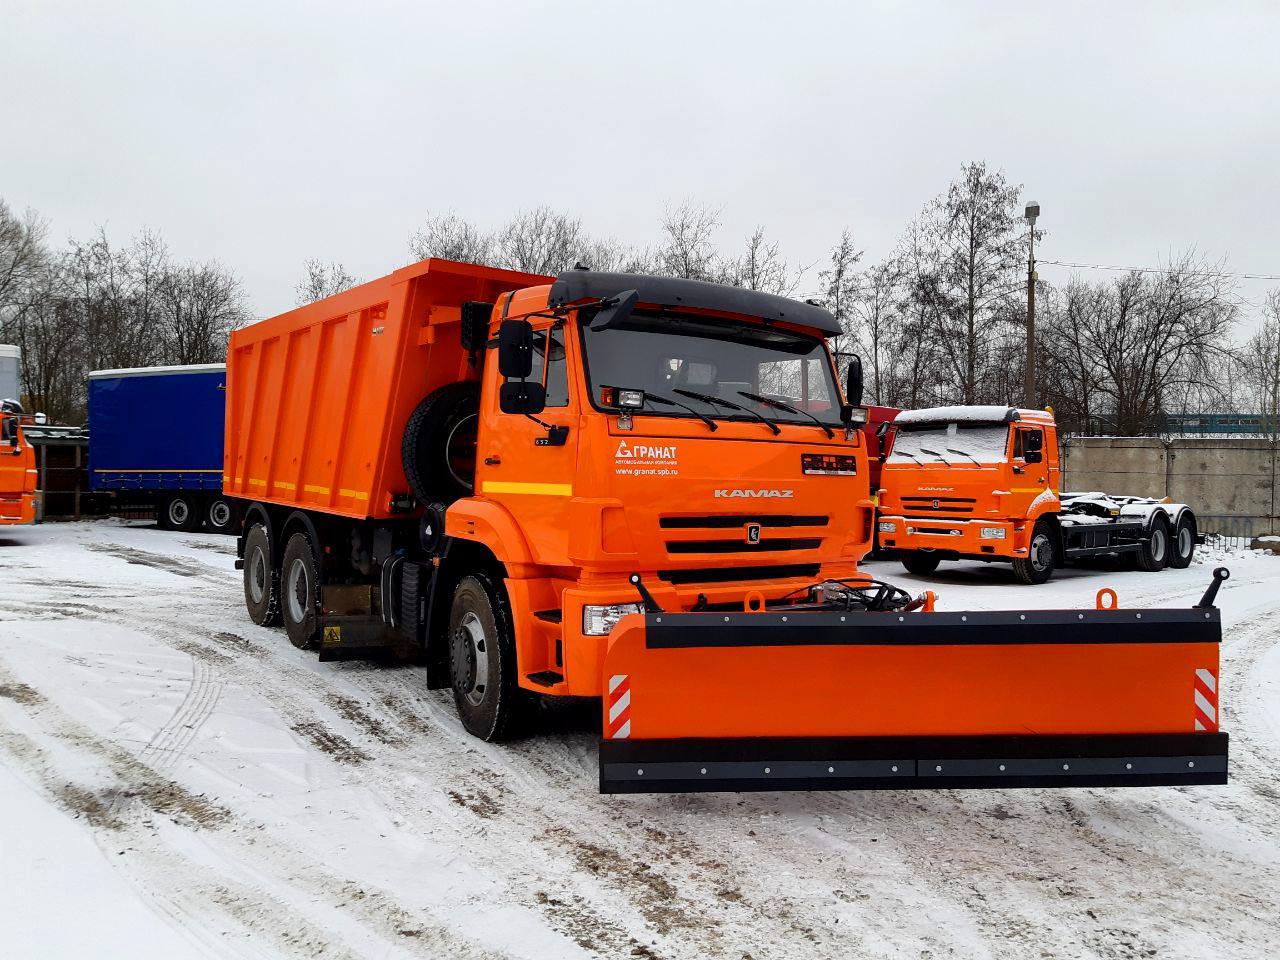 Дорожно-уборочная техника для Ленинградской области